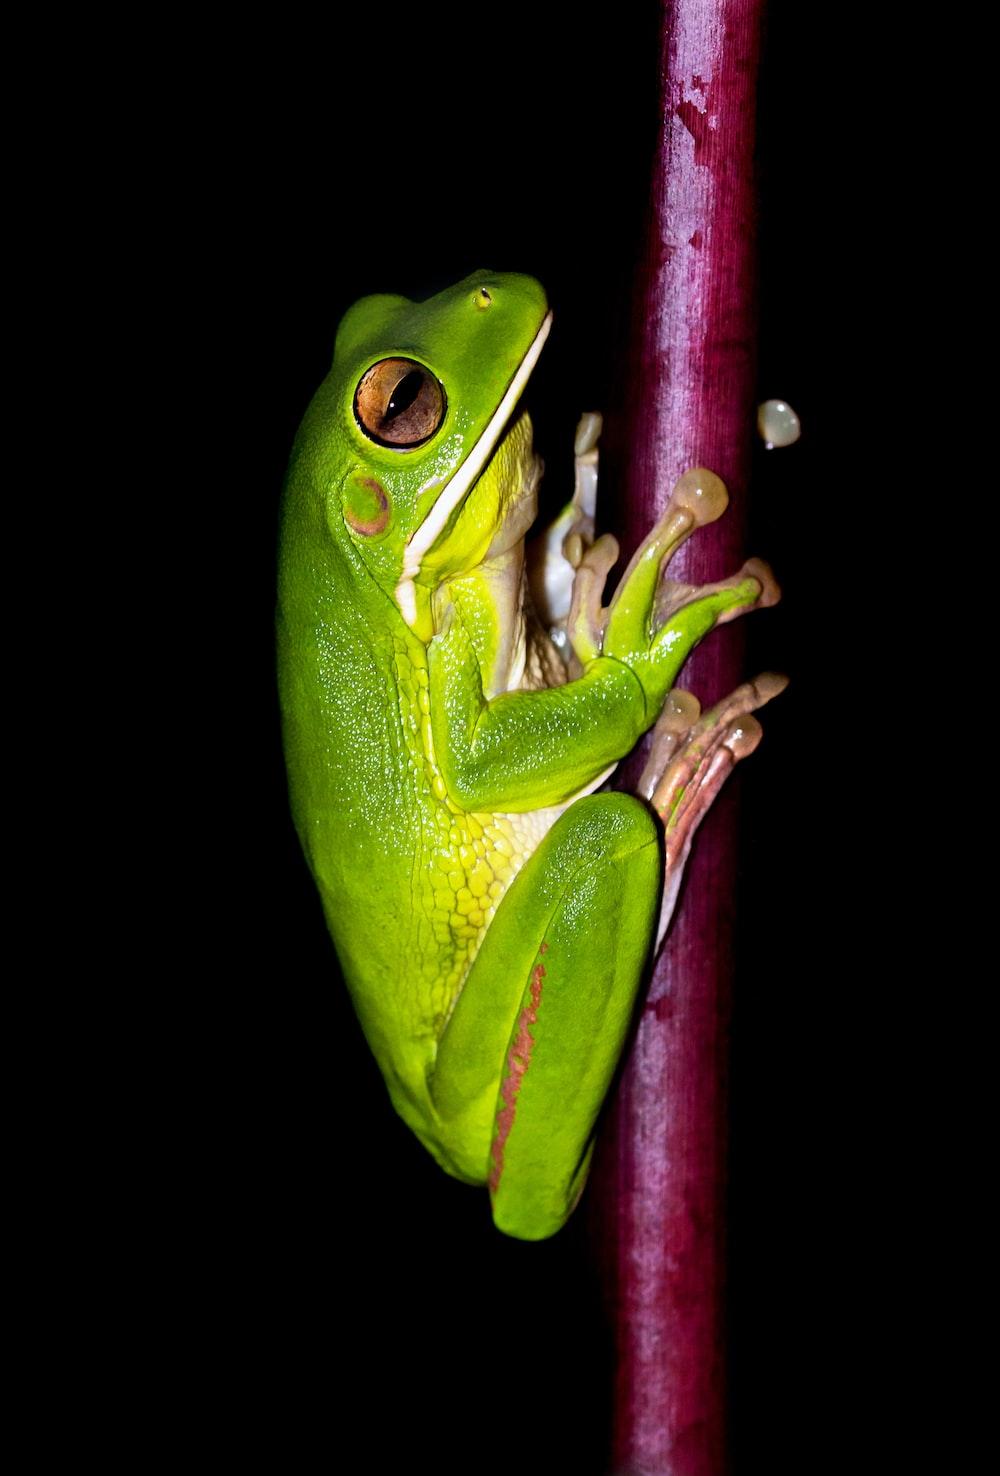 green frog on red stem